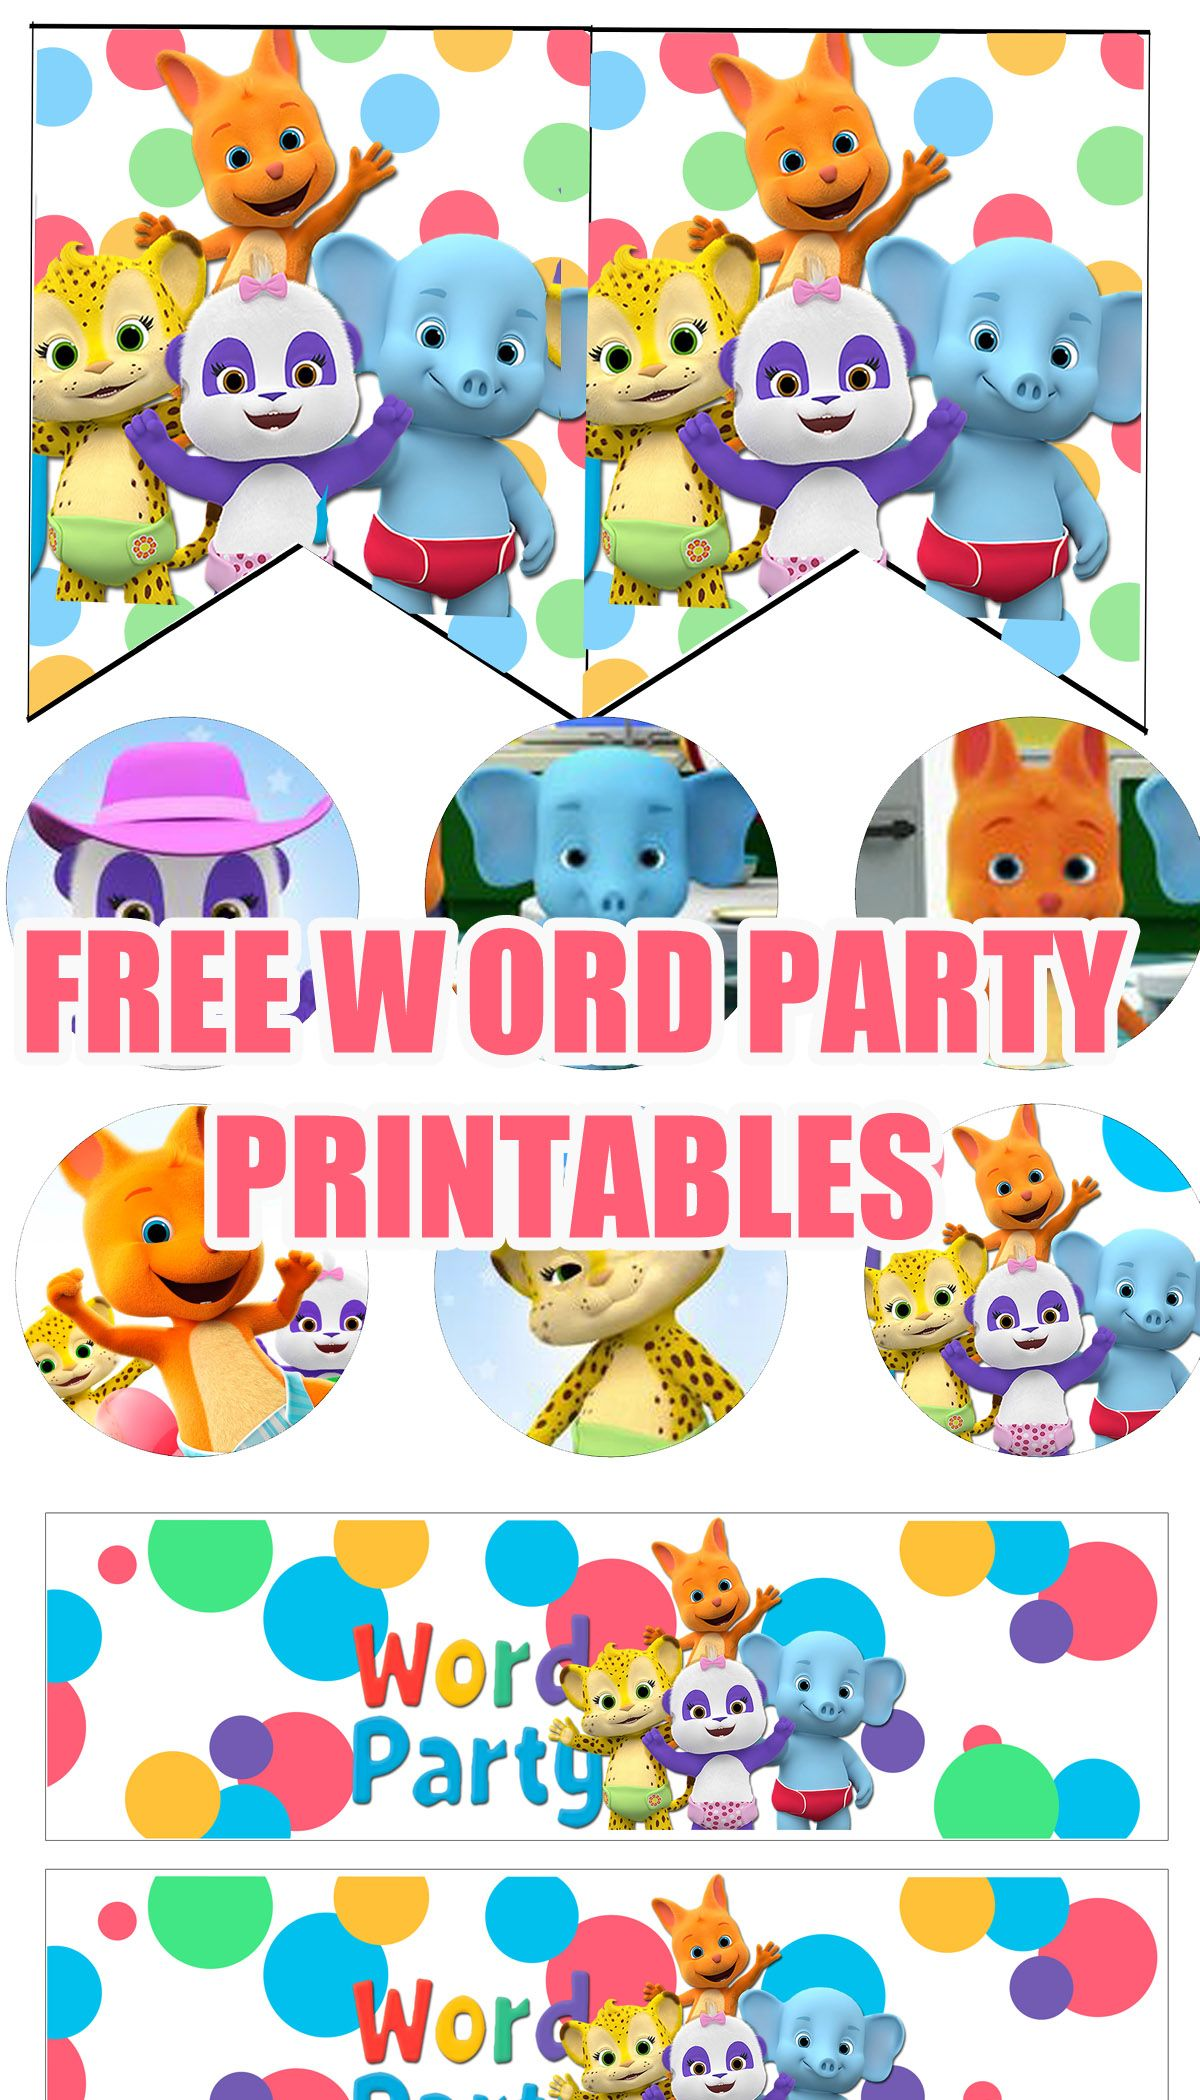 FREE Word Party Birthday Printable Files